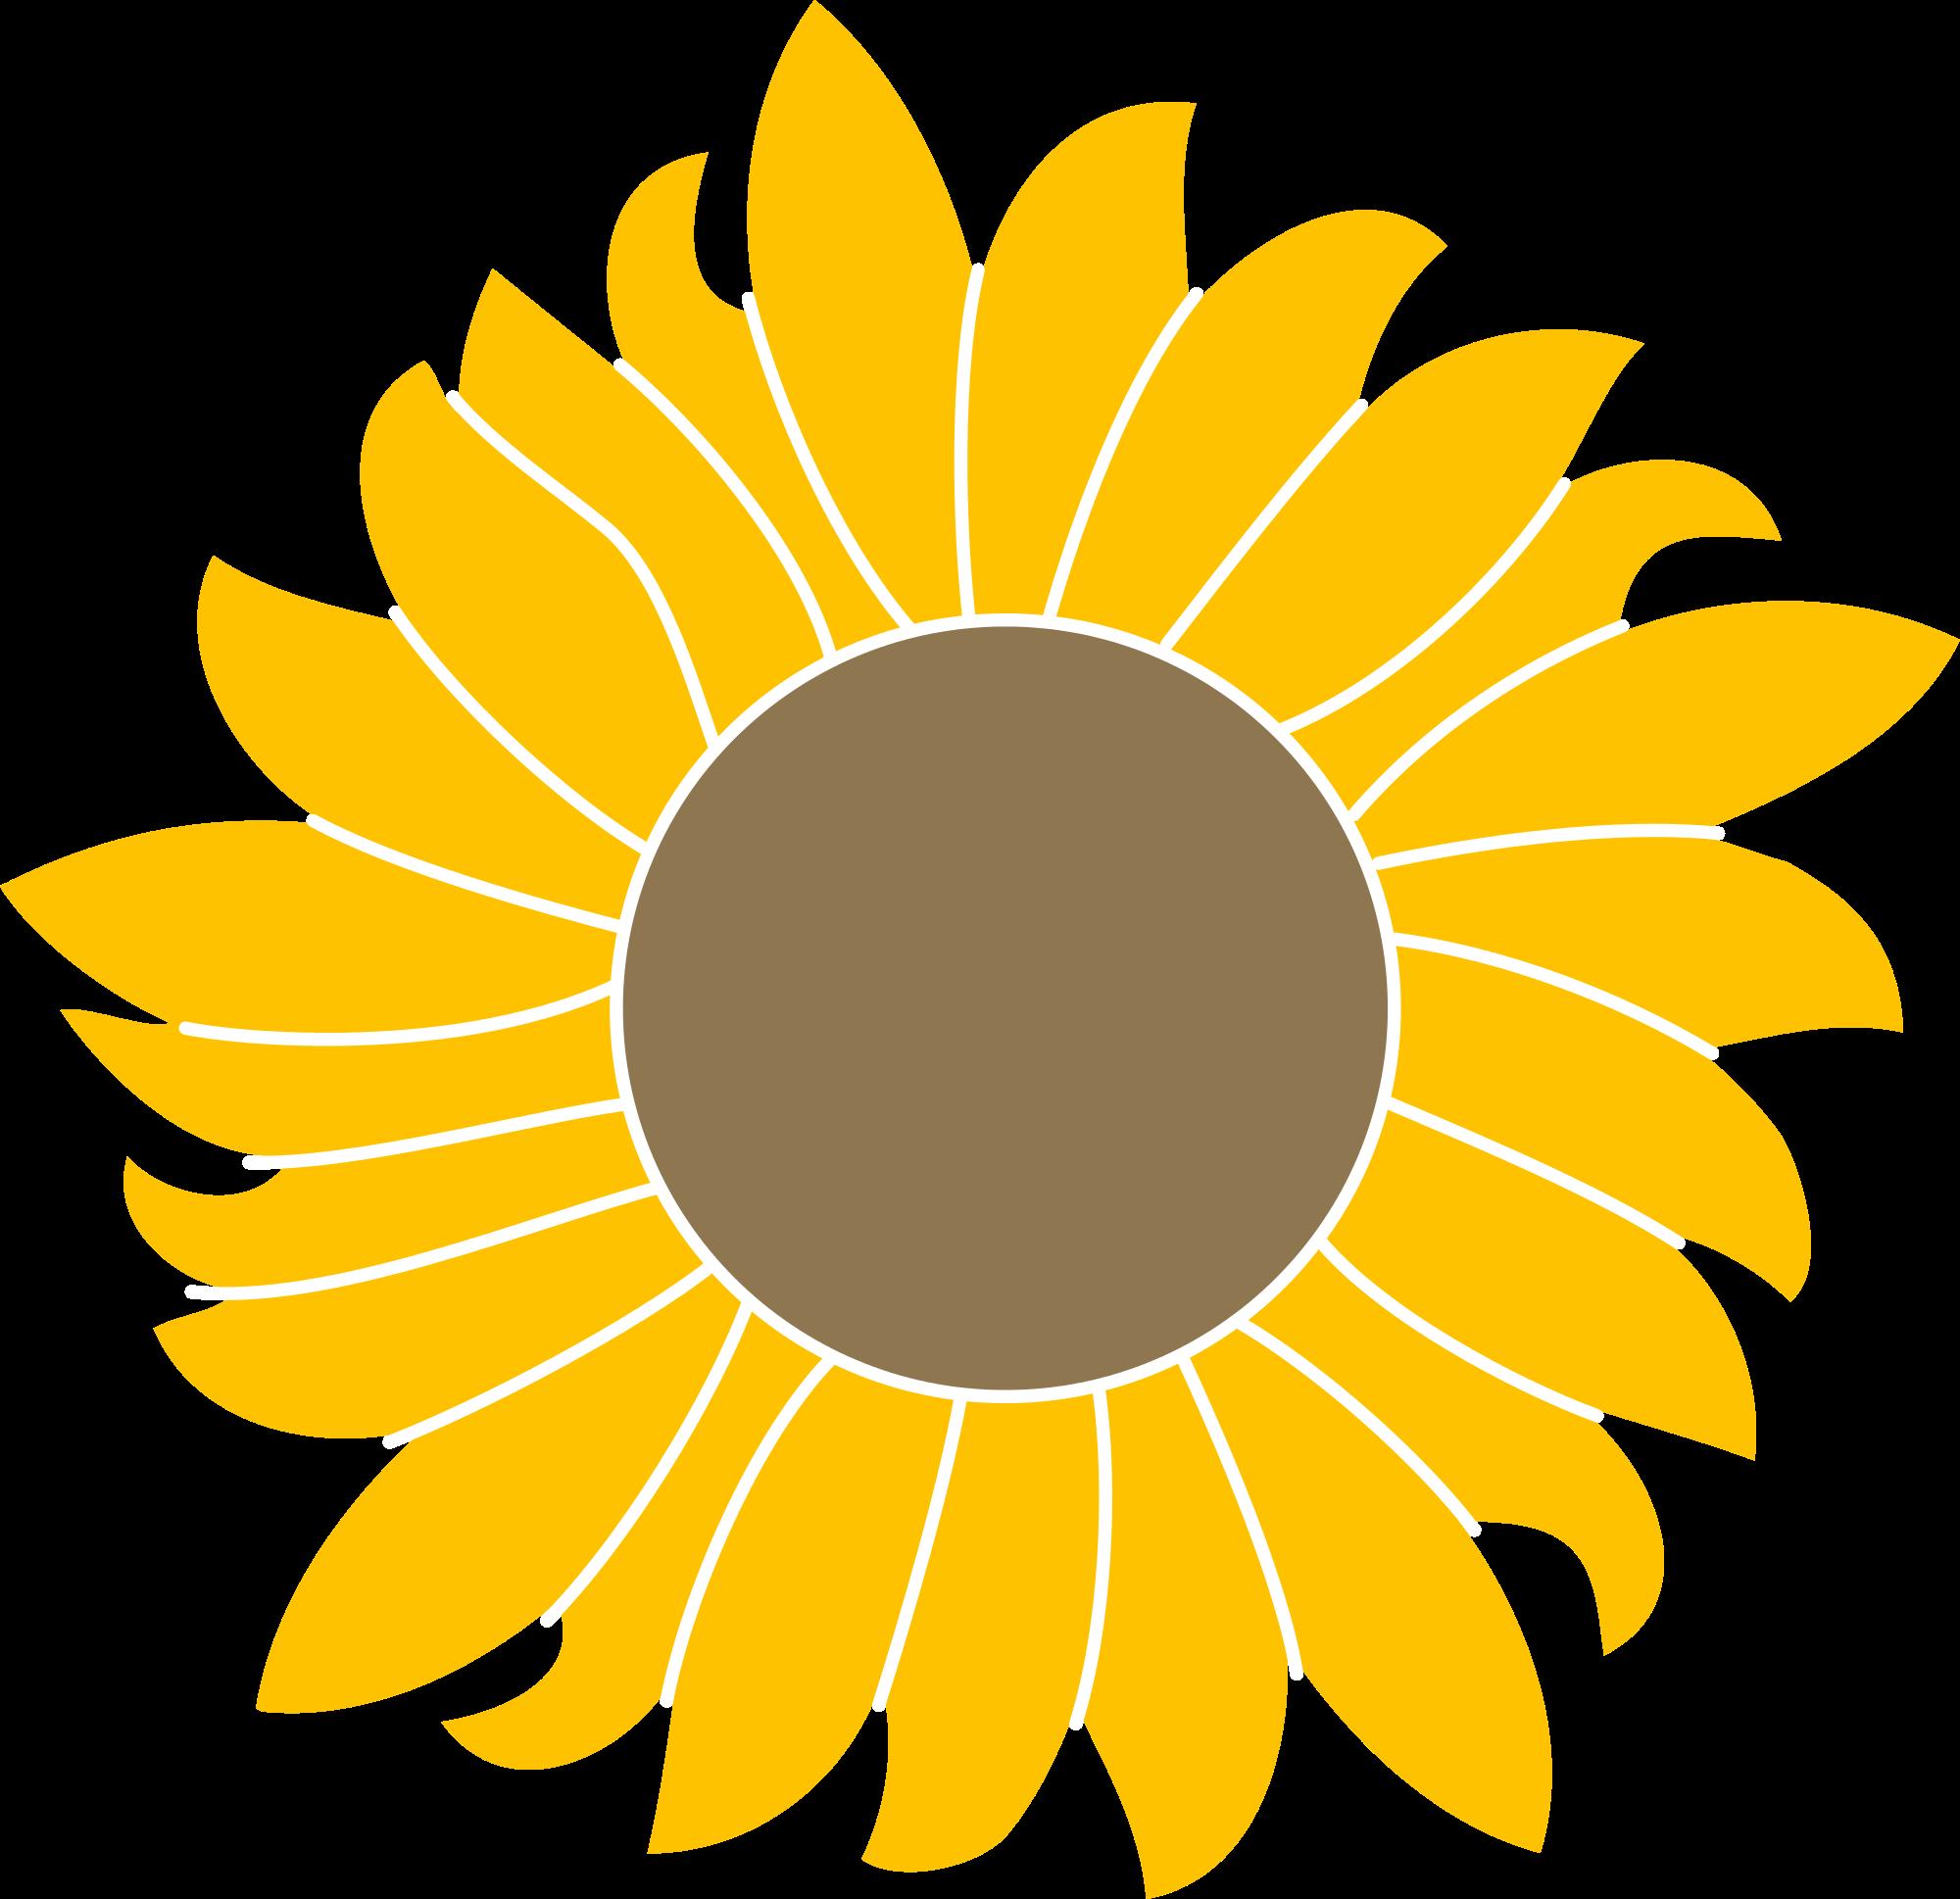 Flower clipart jpg clip transparent stock Sun Flower Clipart#4008886 - Shop of Clipart Library clip transparent stock